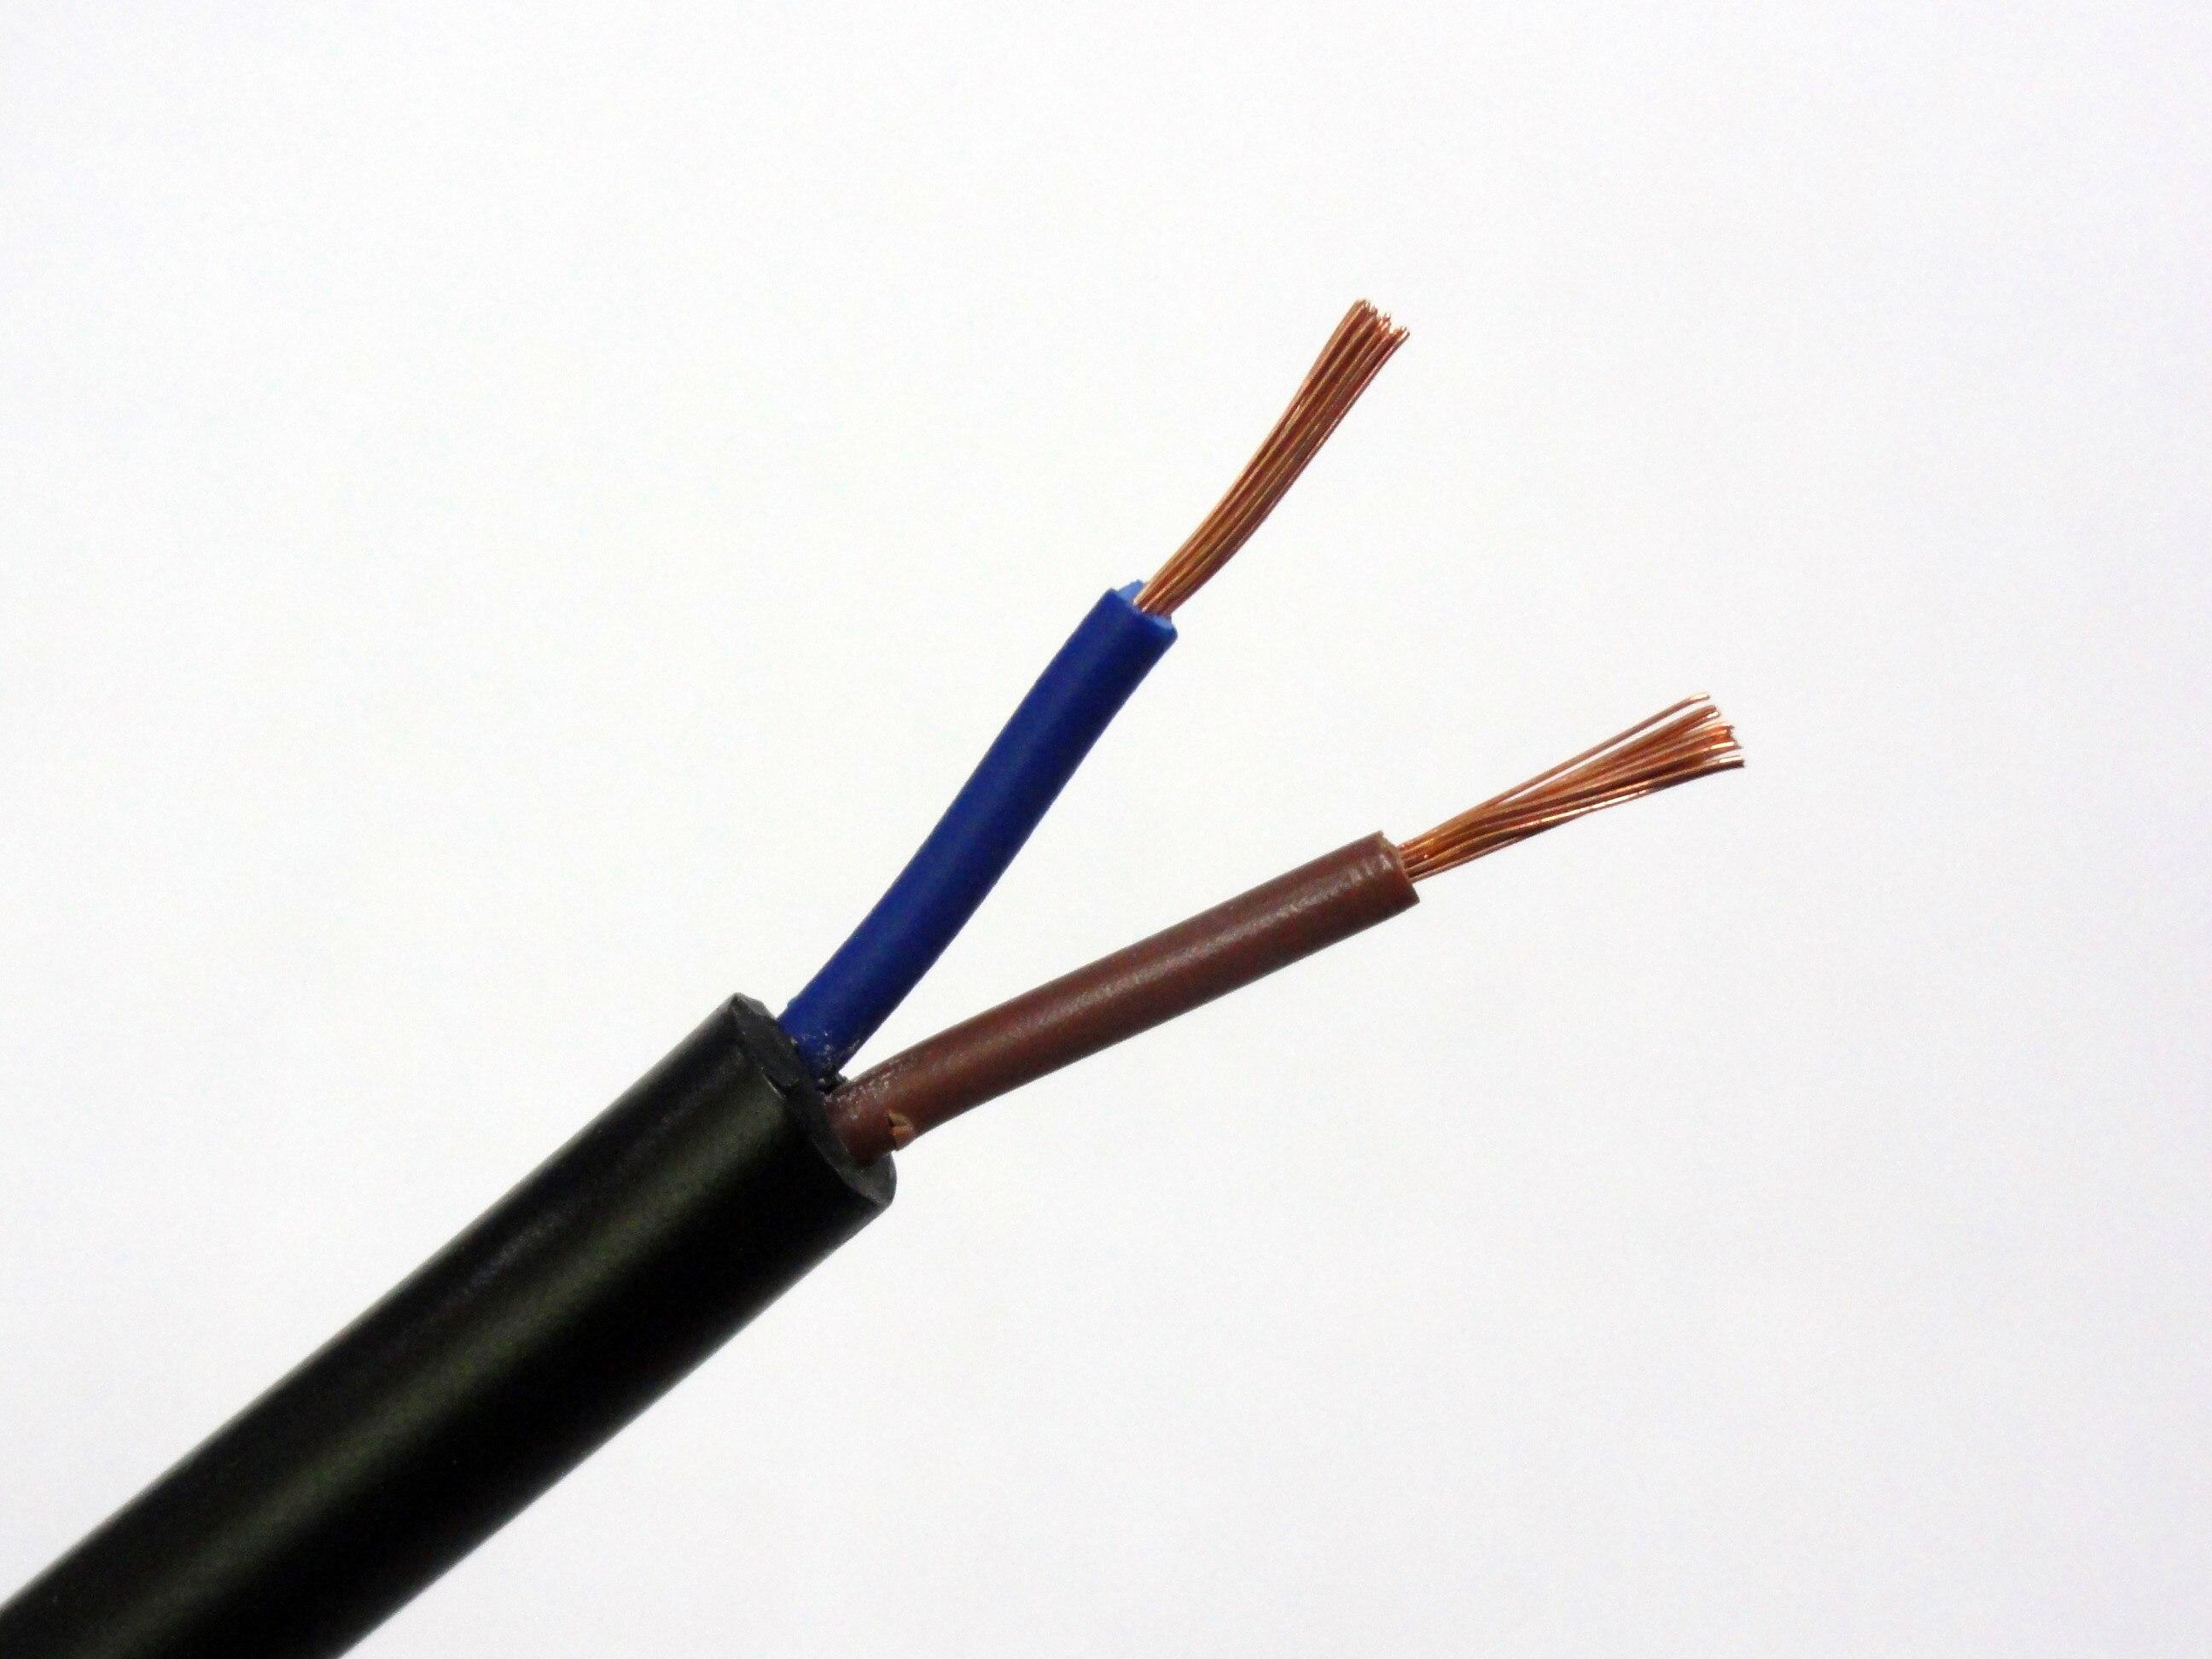 Cable TRIUMPHCABLE/SHENGPAI negro de alta flexibilidad 1/2M RVV 1,0mm 2/3/4/5 núcleos hilo...